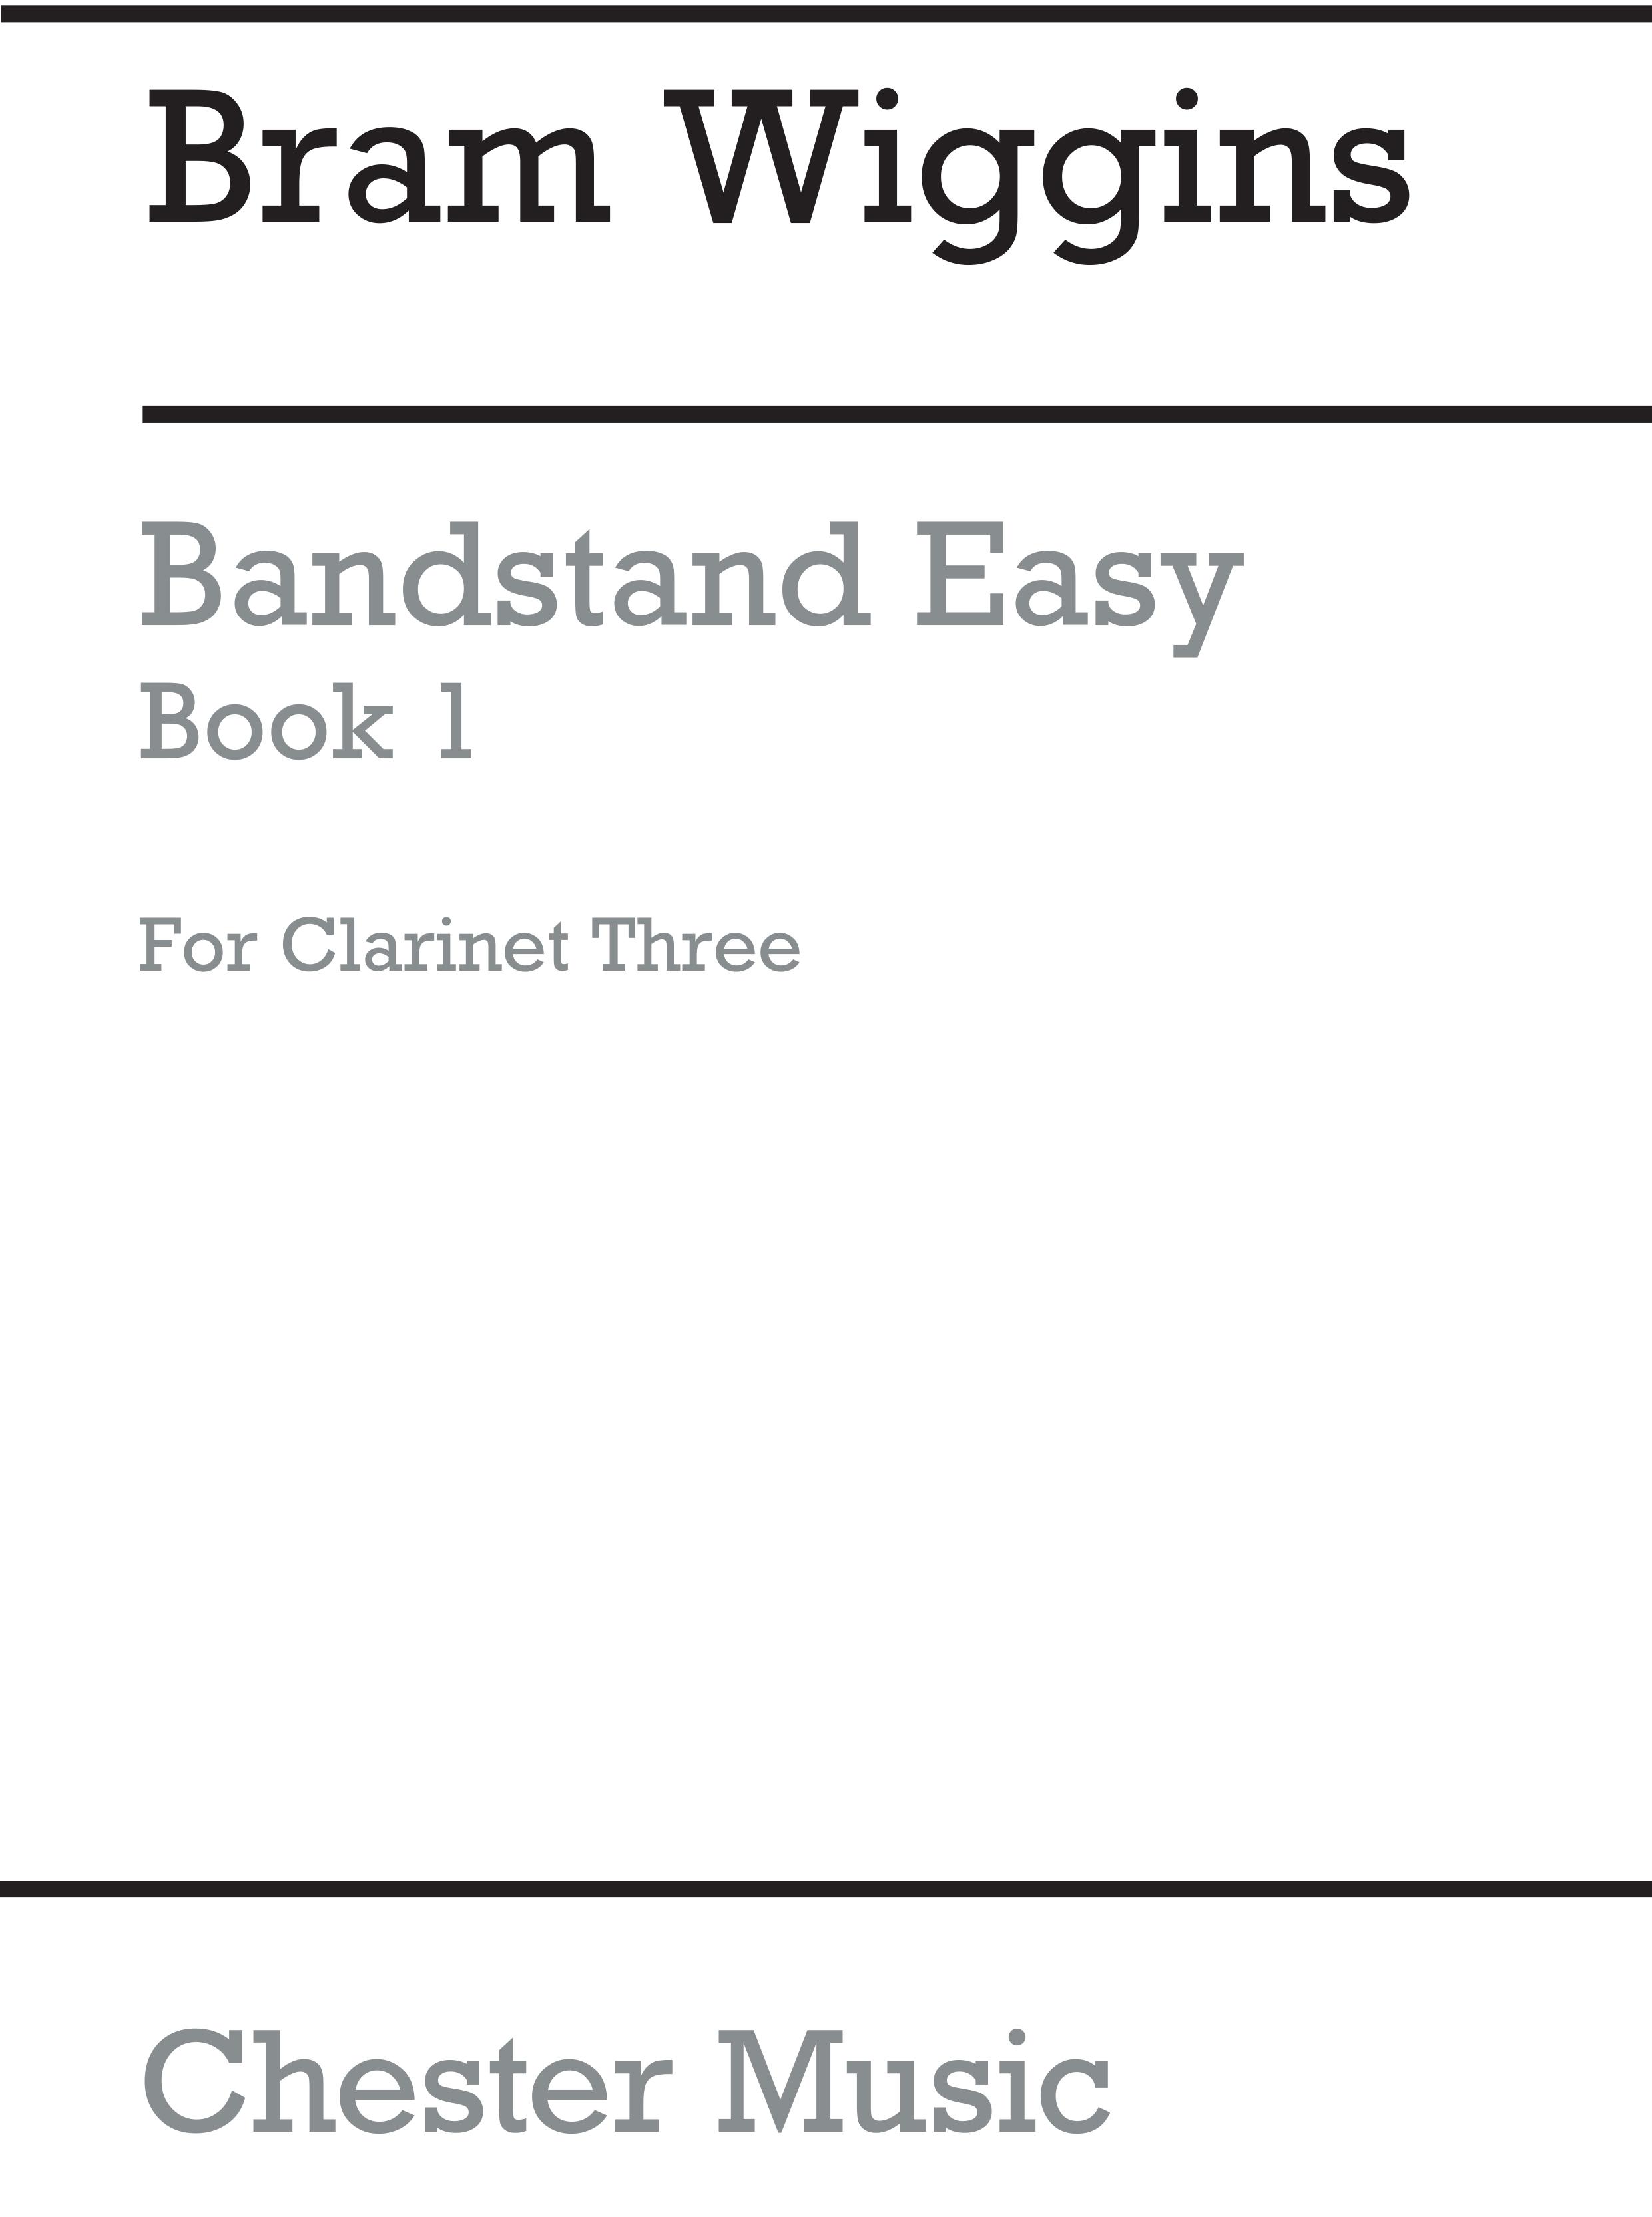 Bram Wiggins: Bandstand Easy Book 1 (Clarinet 3): Concert Band: Part